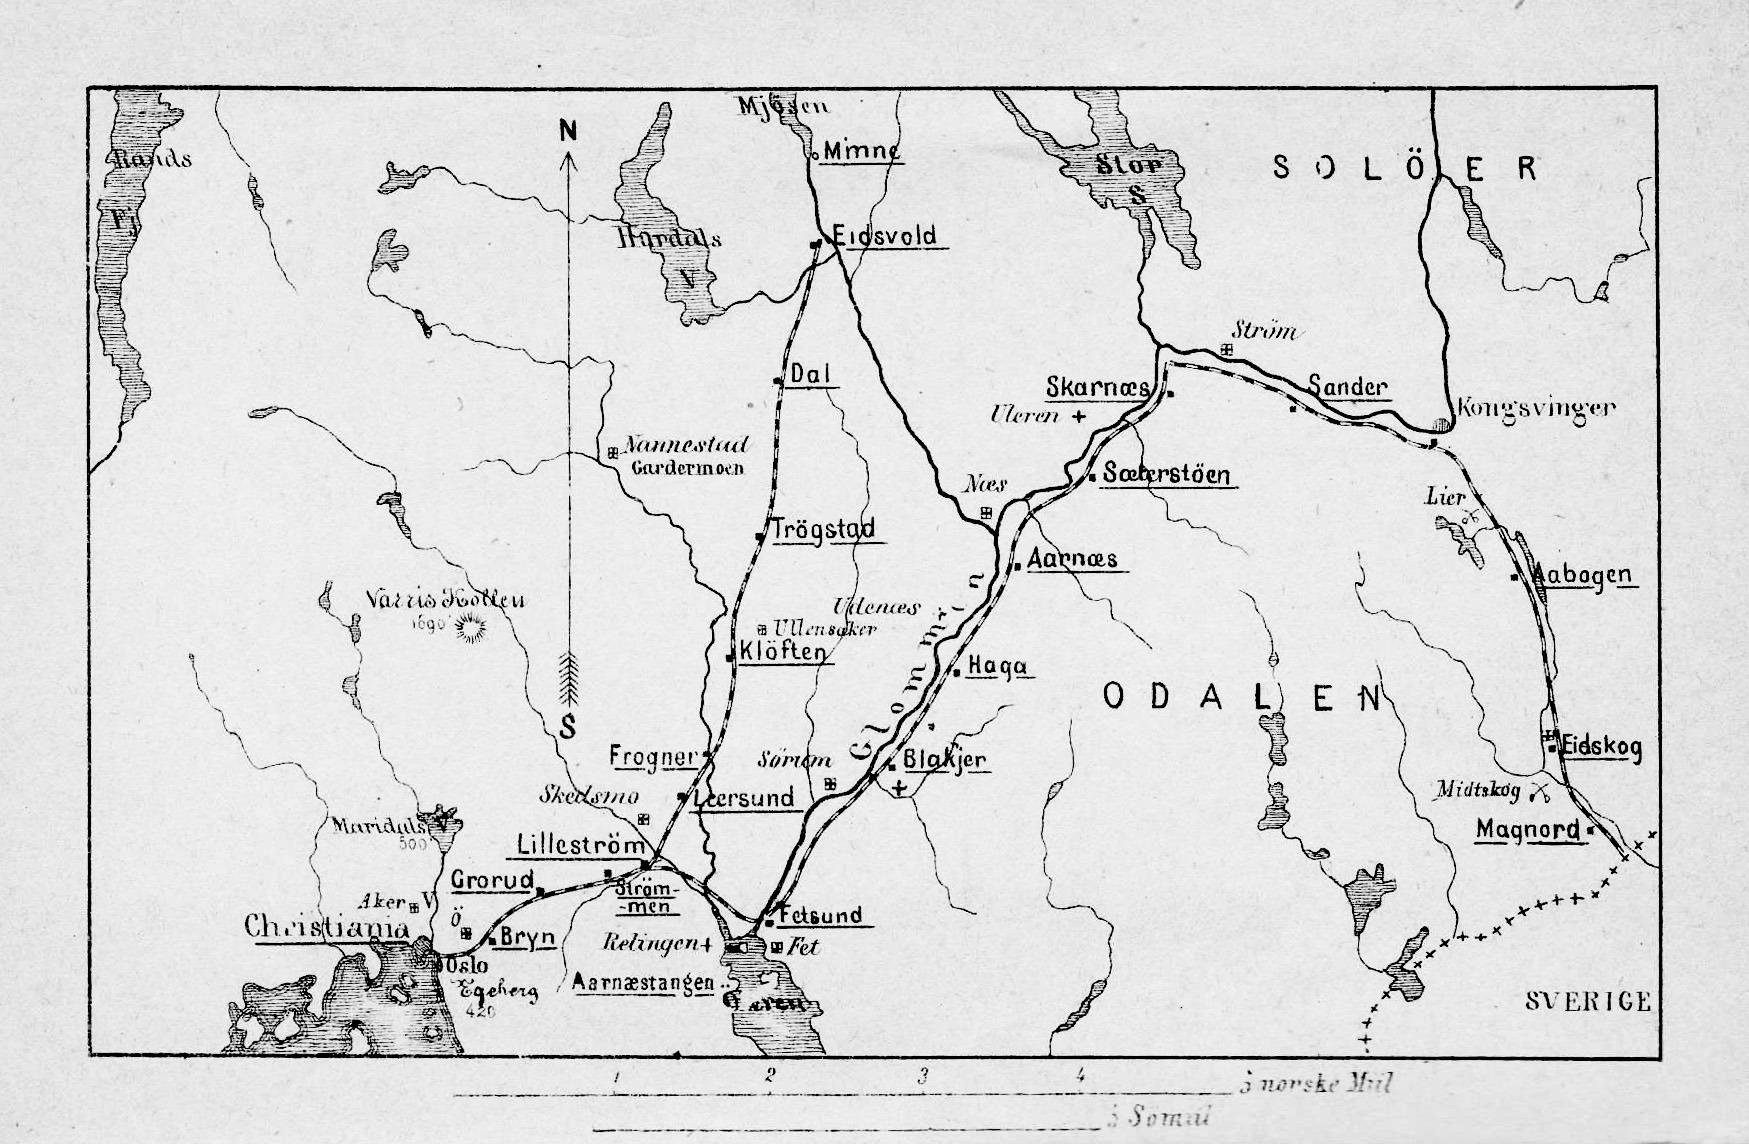 jernbanekart-rundt-1870.jpg